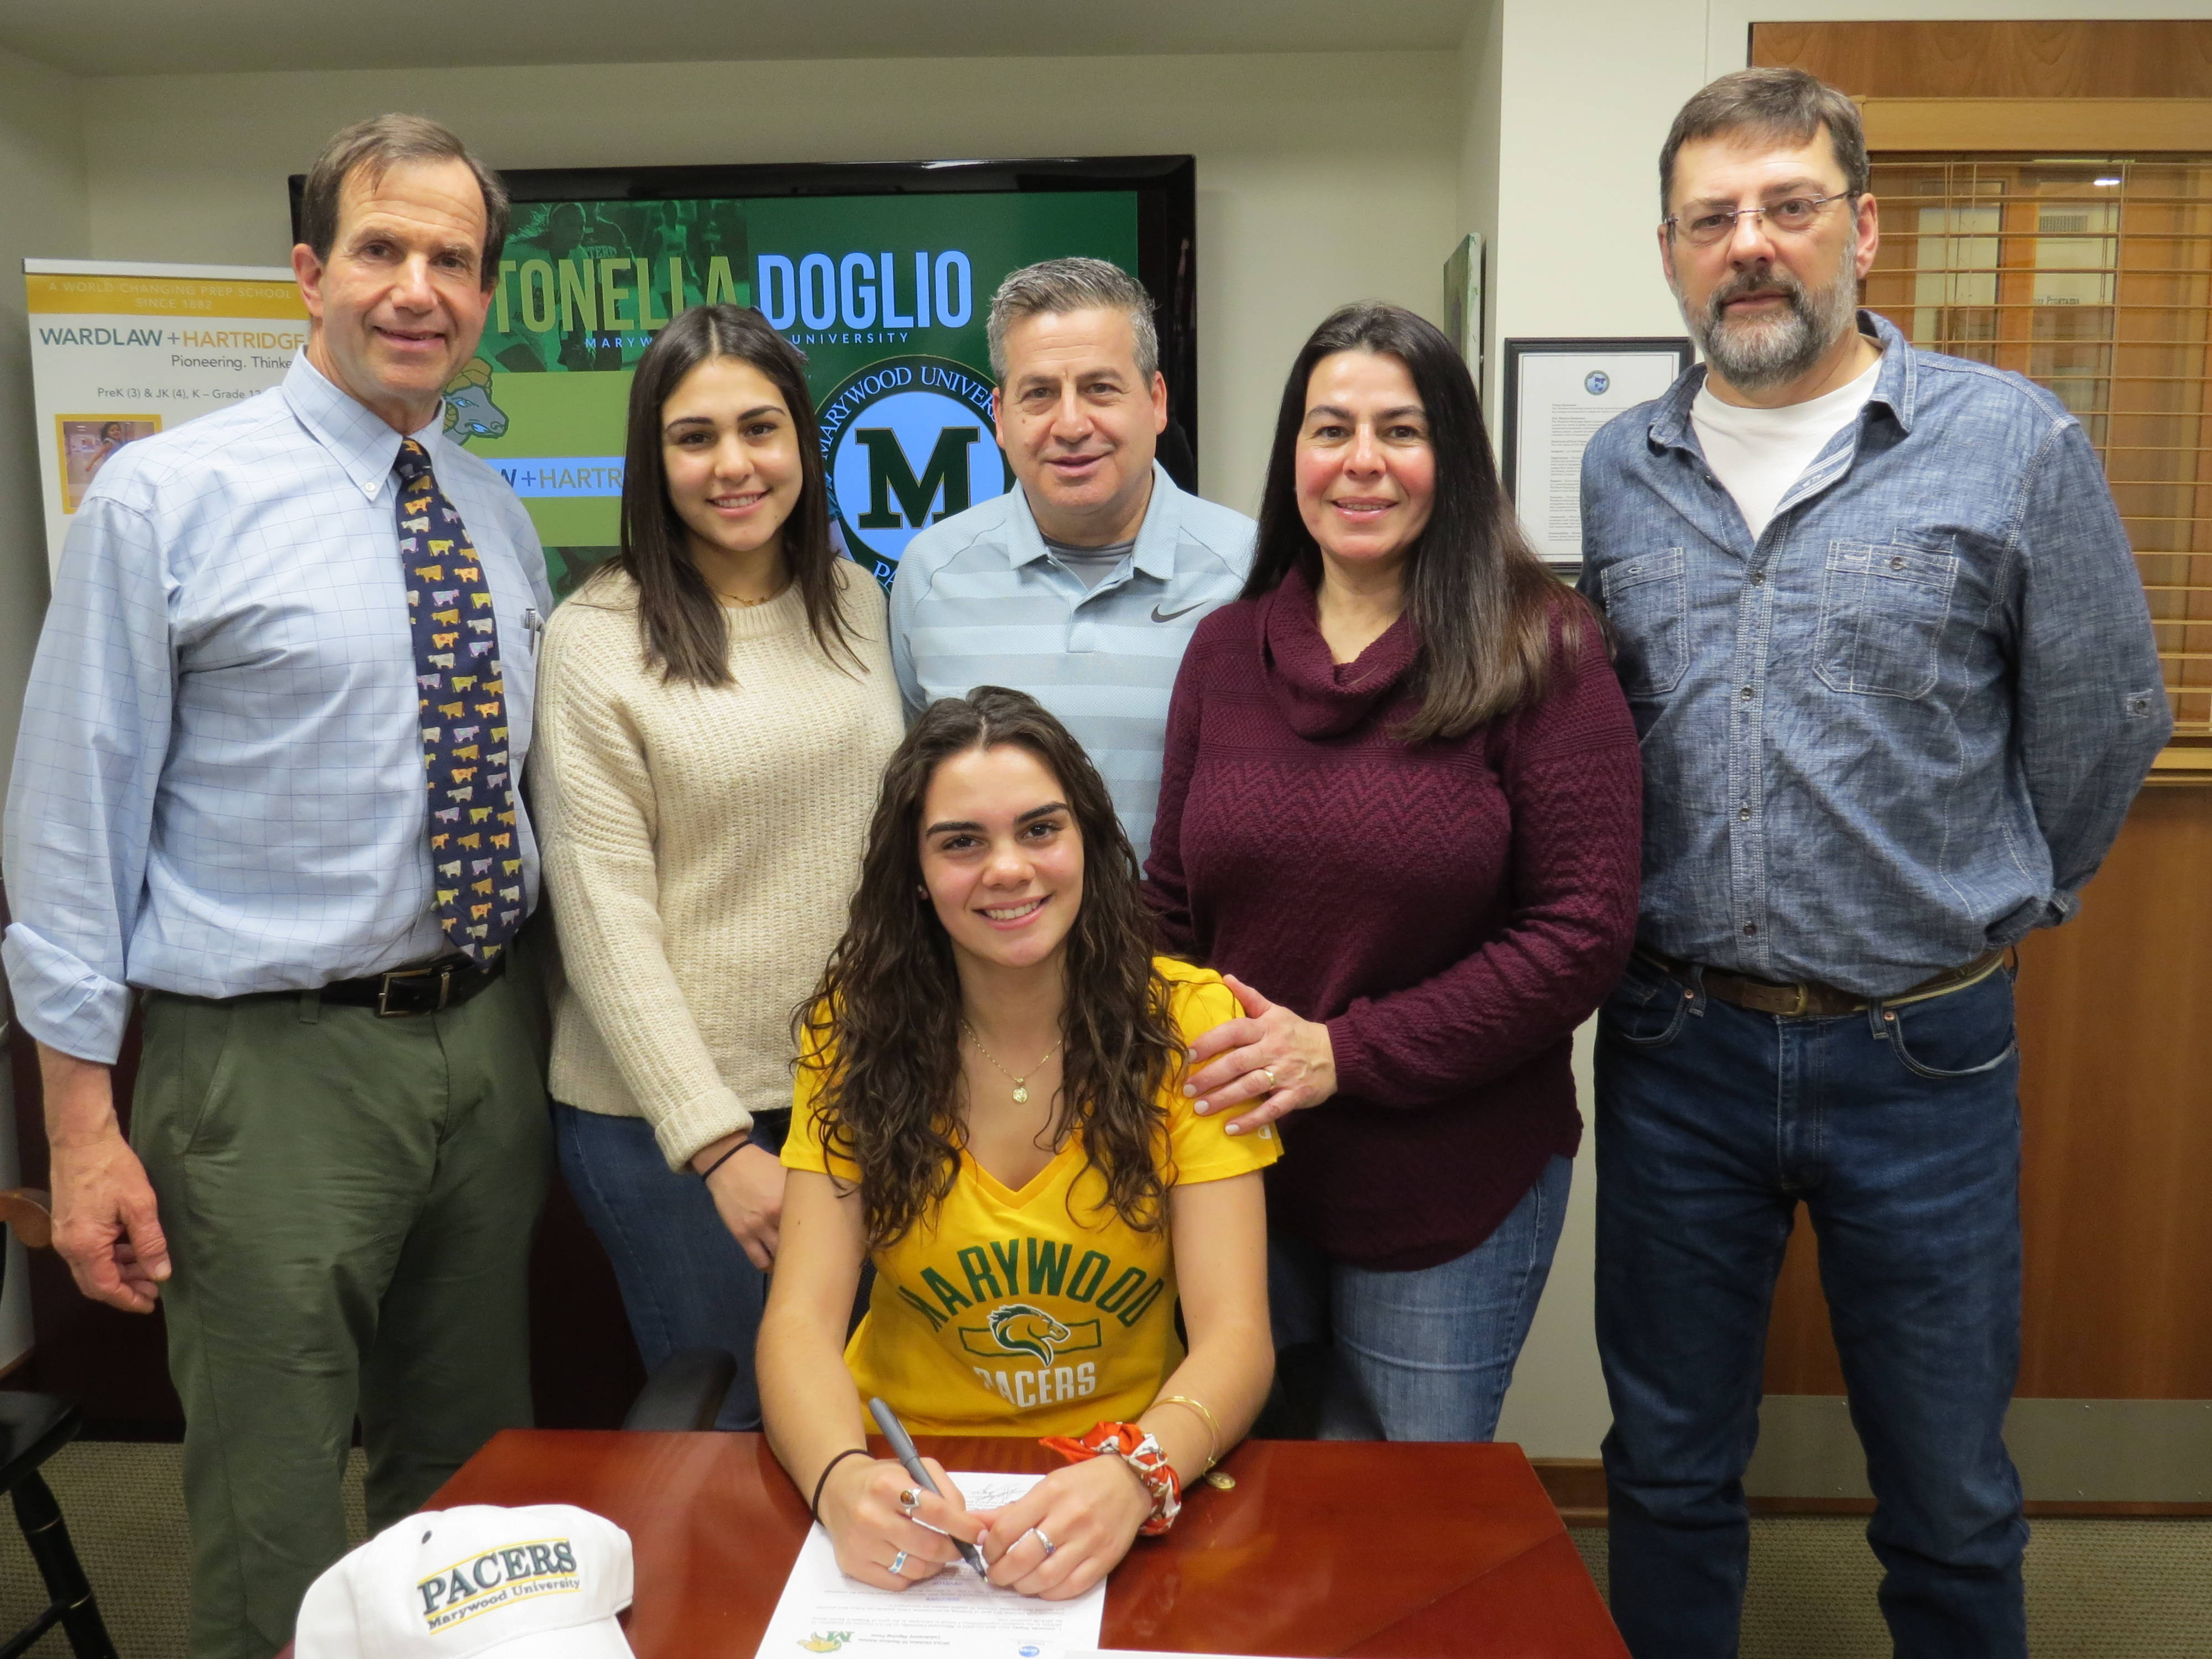 Antonella Doglio Signing.JPG